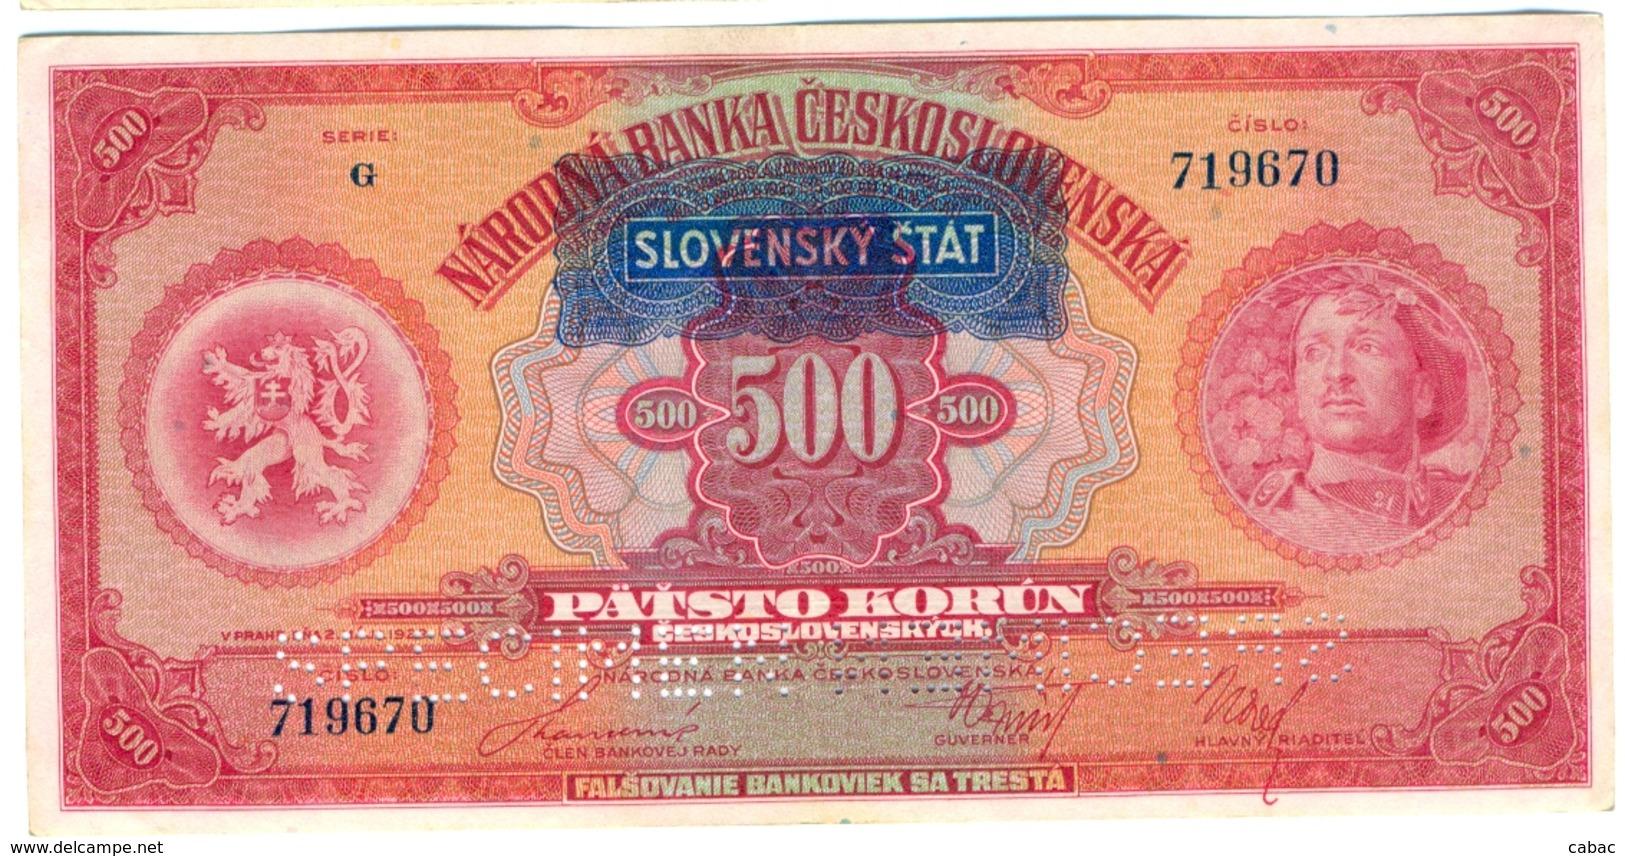 Czechoslovakia, 500 Korun, 1929, SPECIMEN, Narodna Banka Češkoslovenska, Patsto Korun, Serie G - Tchécoslovaquie